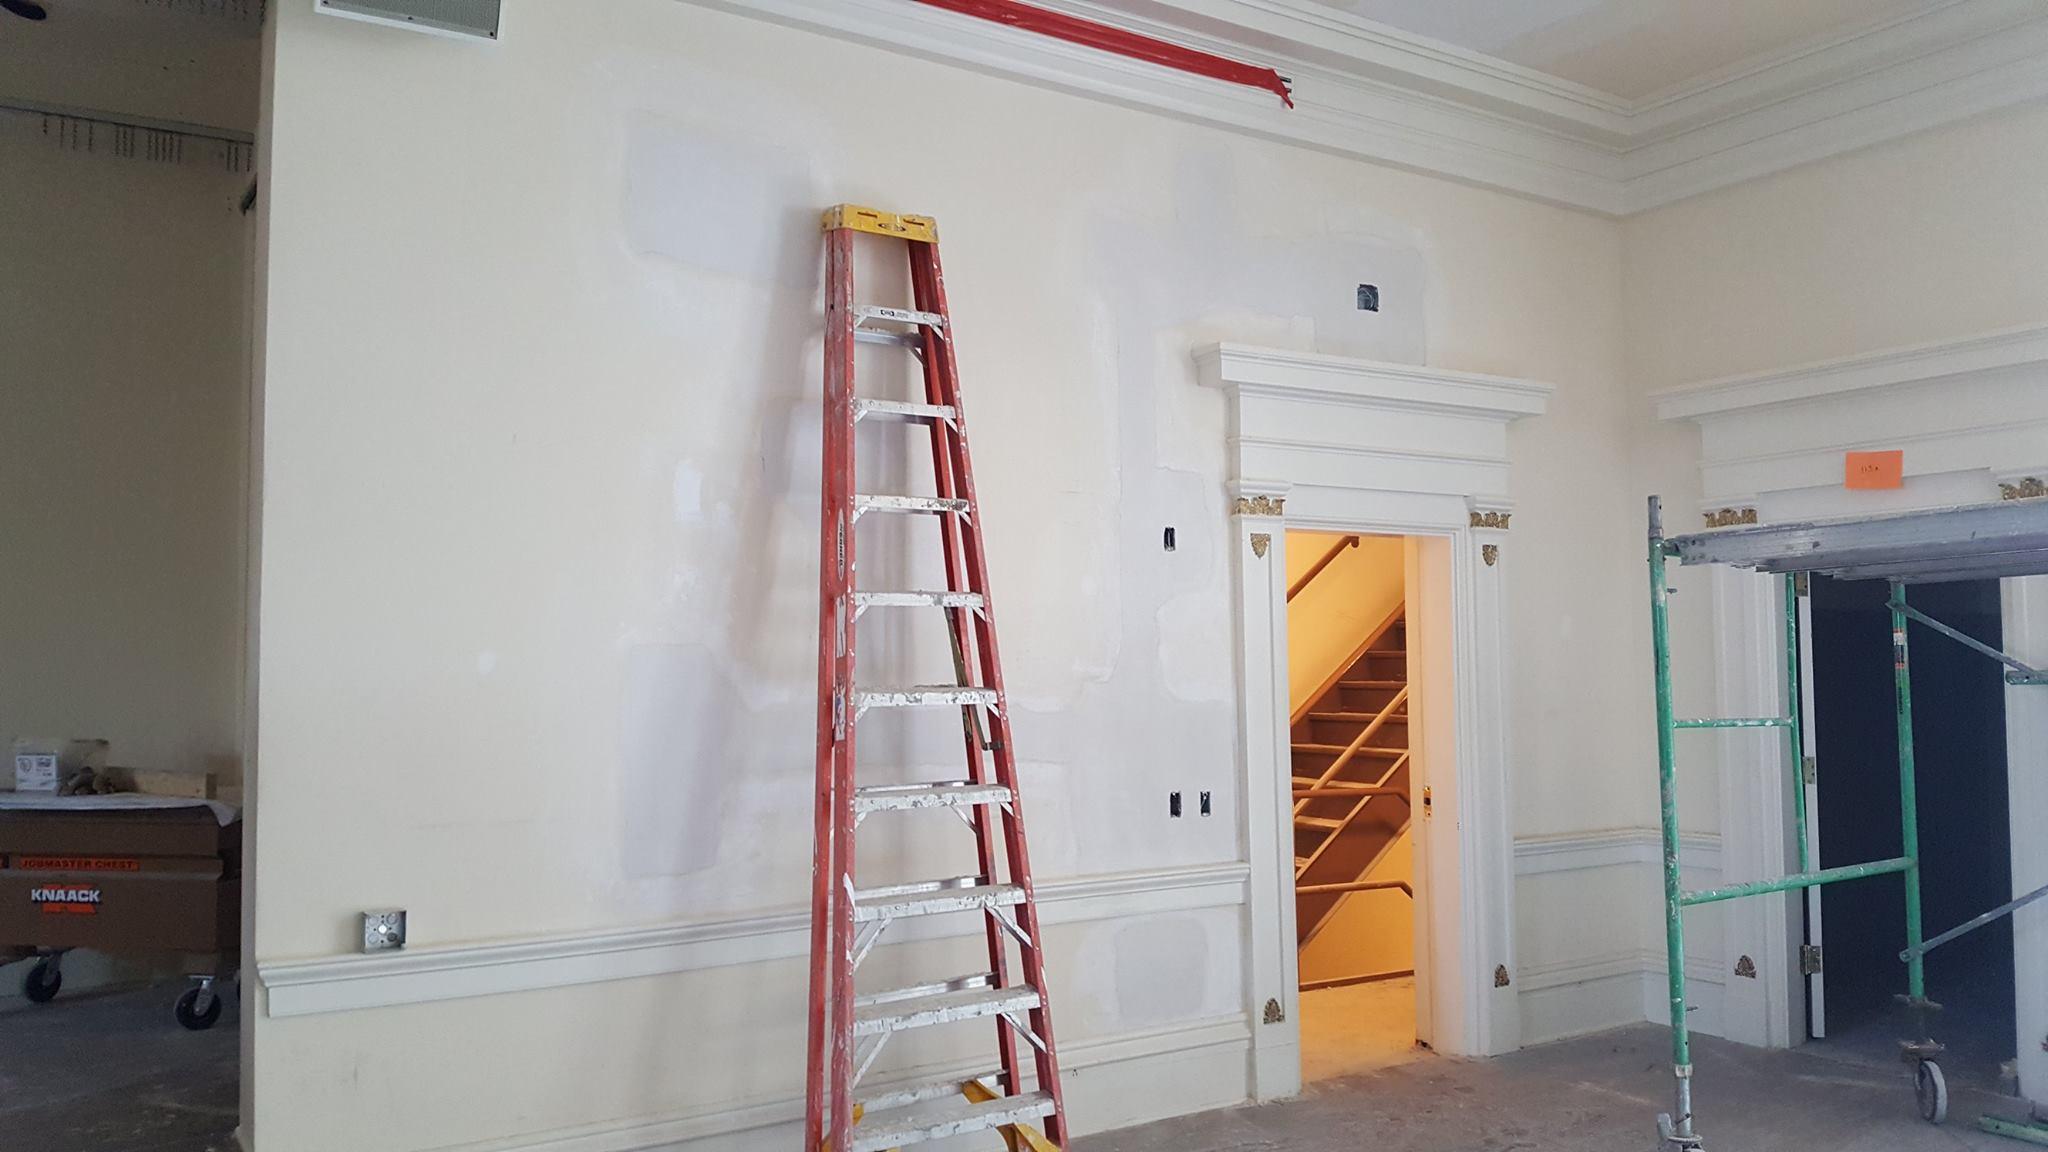 Ballroom plaster looks good-min.jpg